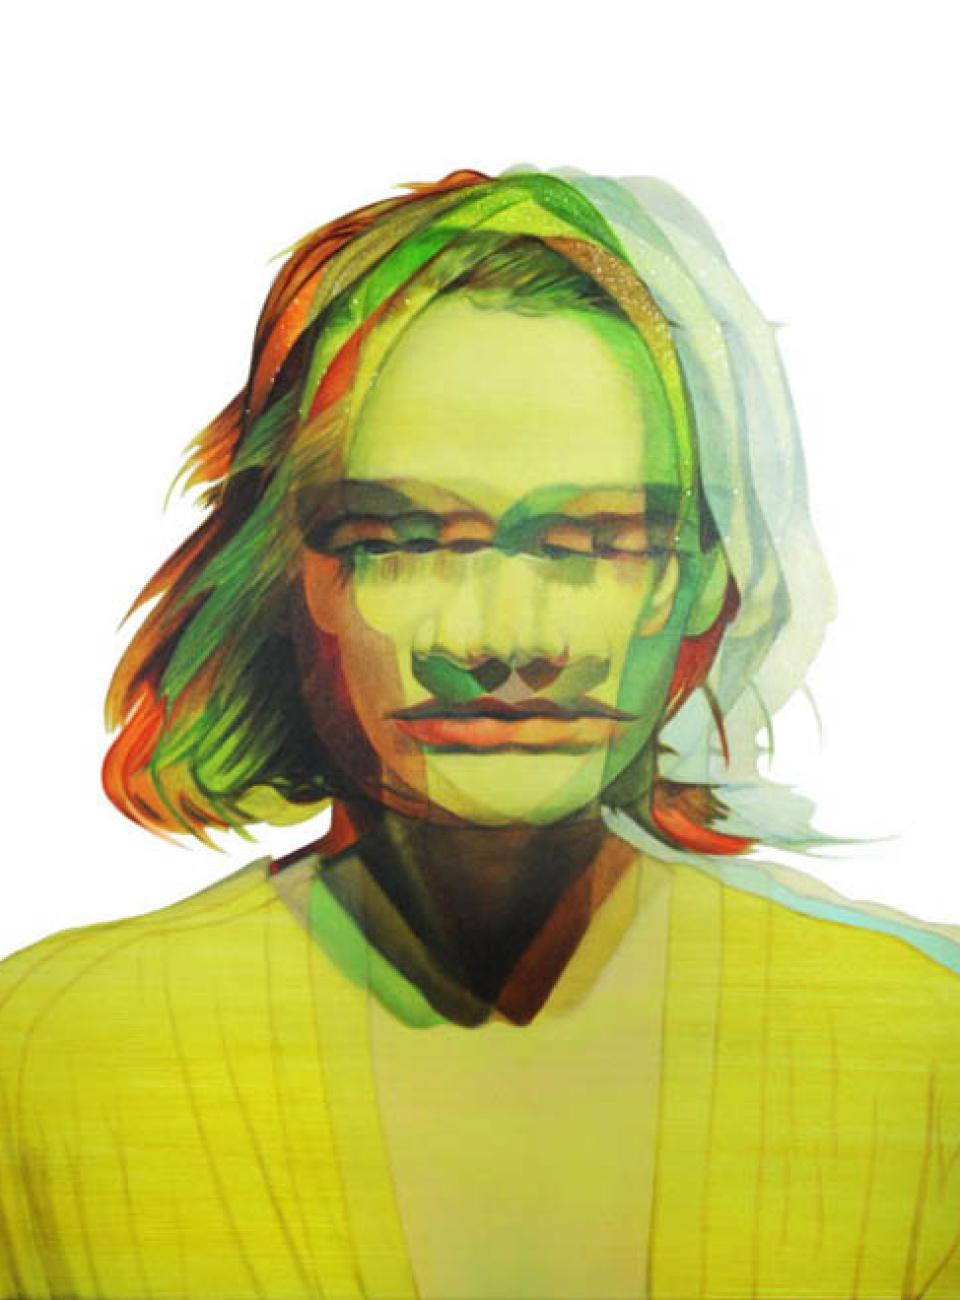 Shift_Martina_Acrylic_on_canvas_170x140cm_2014-960x1300_c